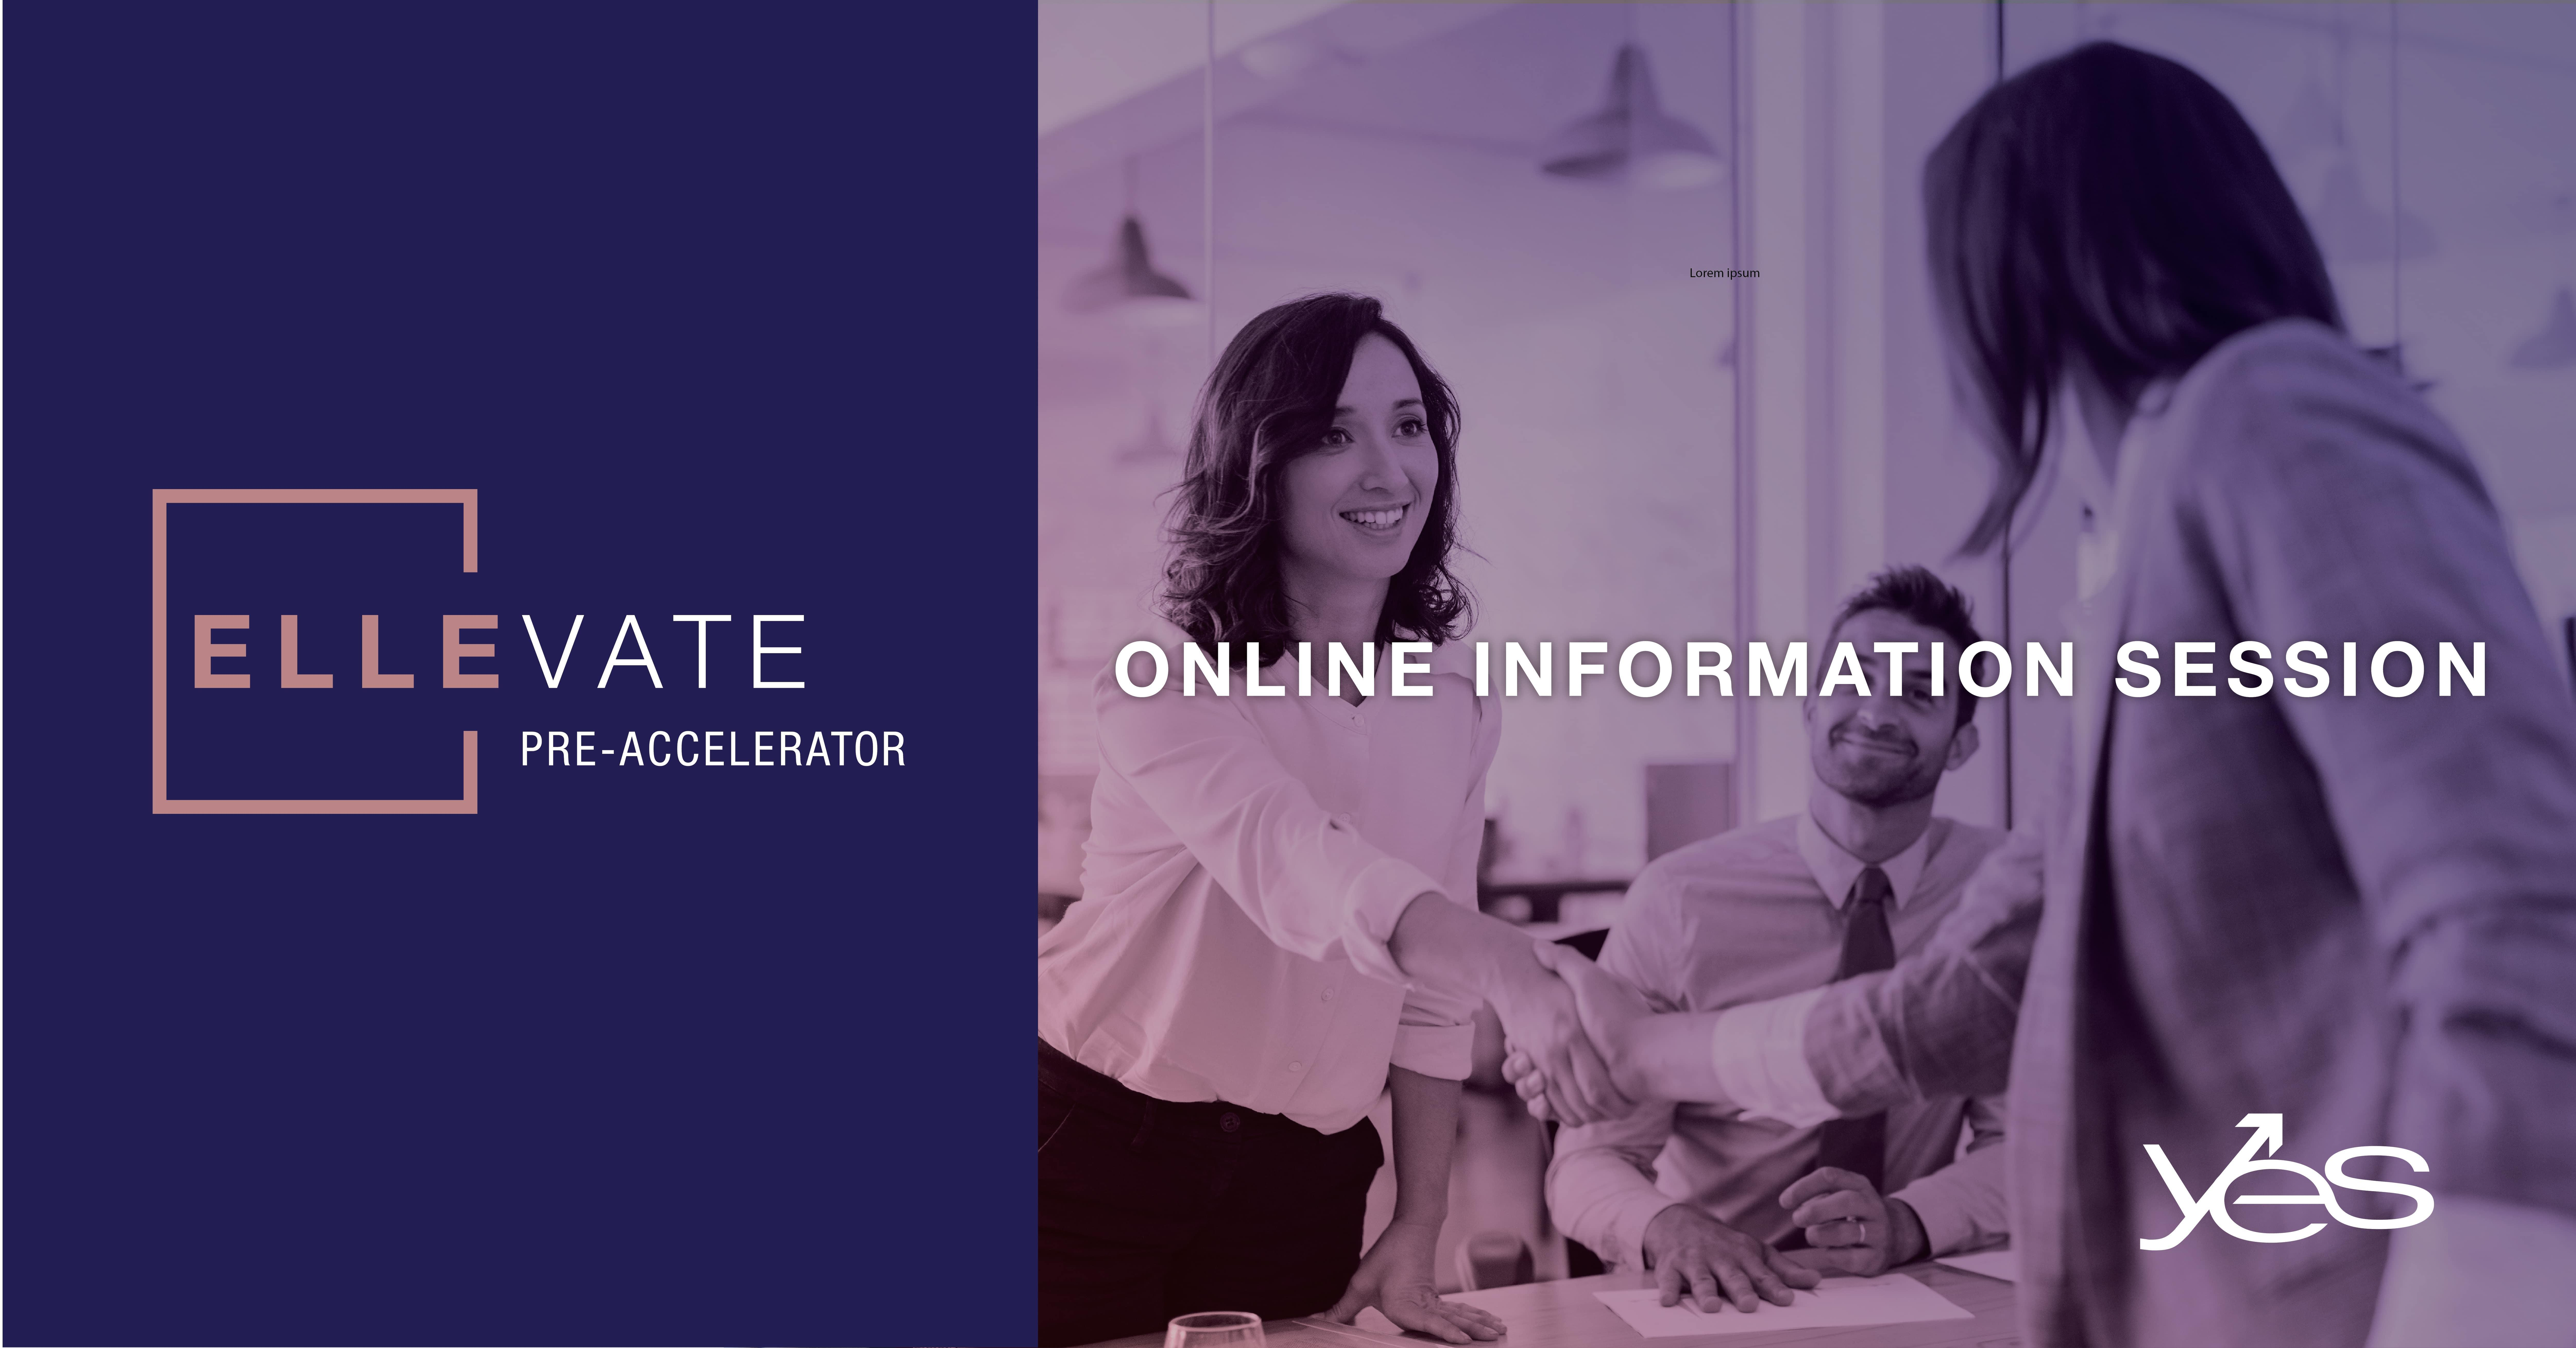 ELLEvate Pre-Accelerator Information Session Winter Spring 2020